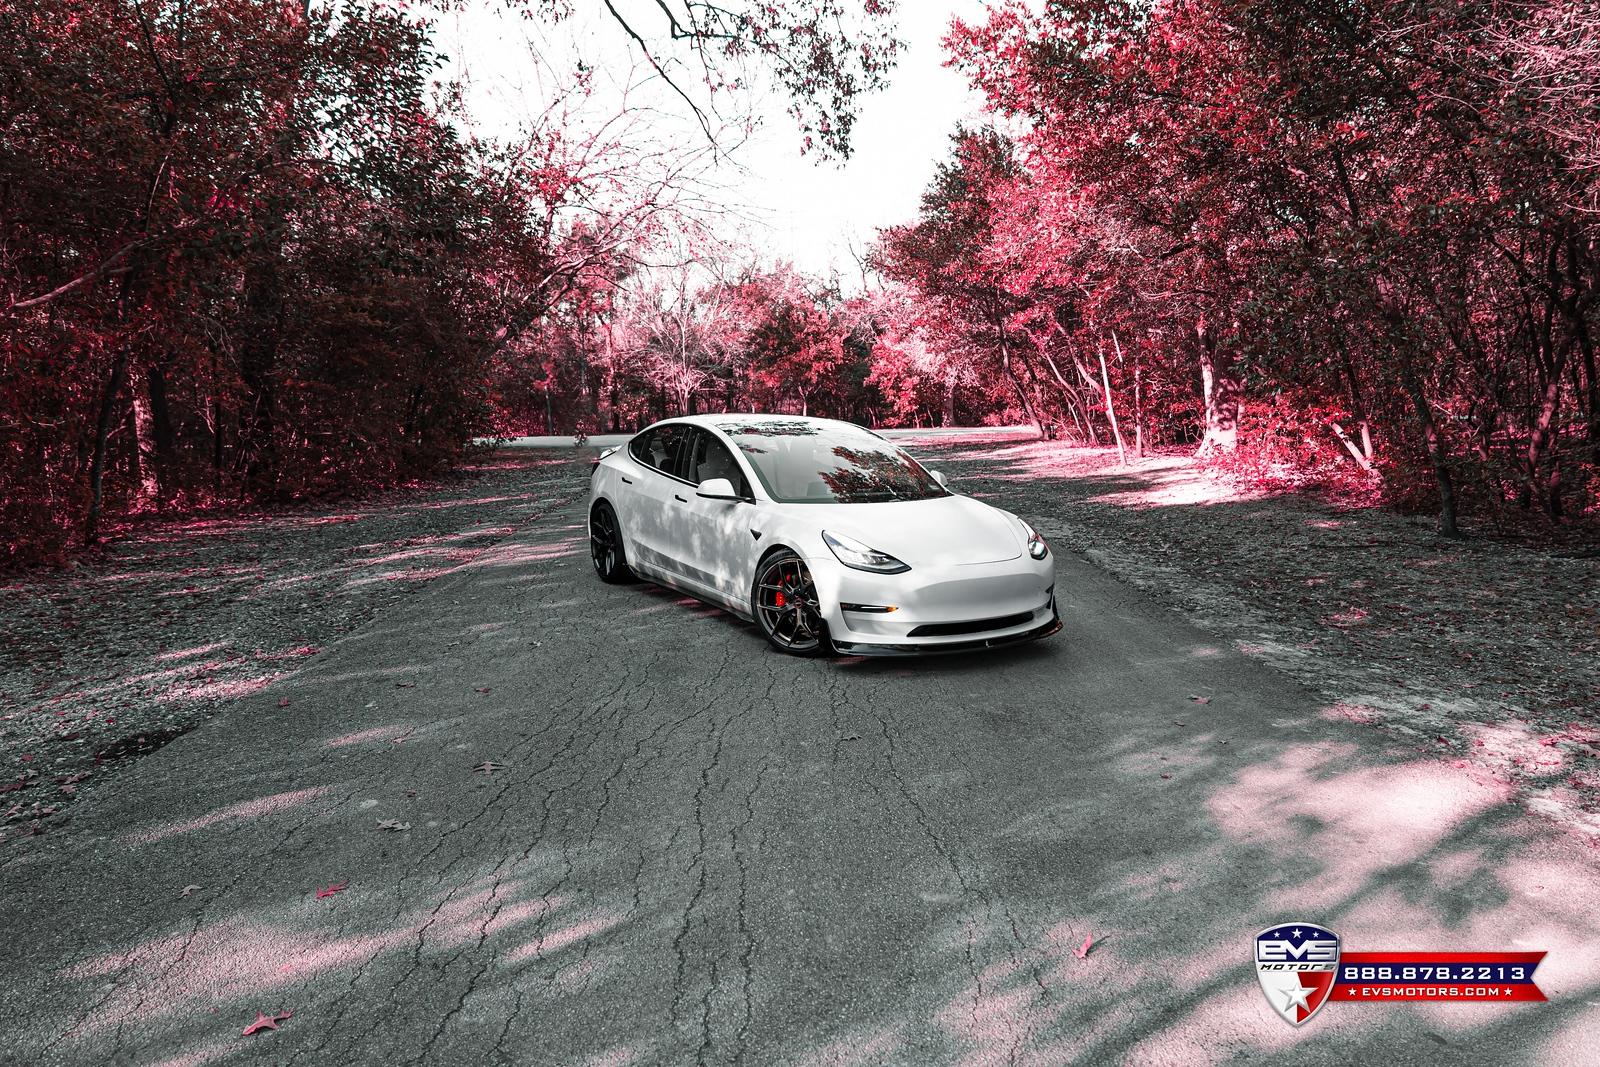 DSC04397-Edit-X3.jpg